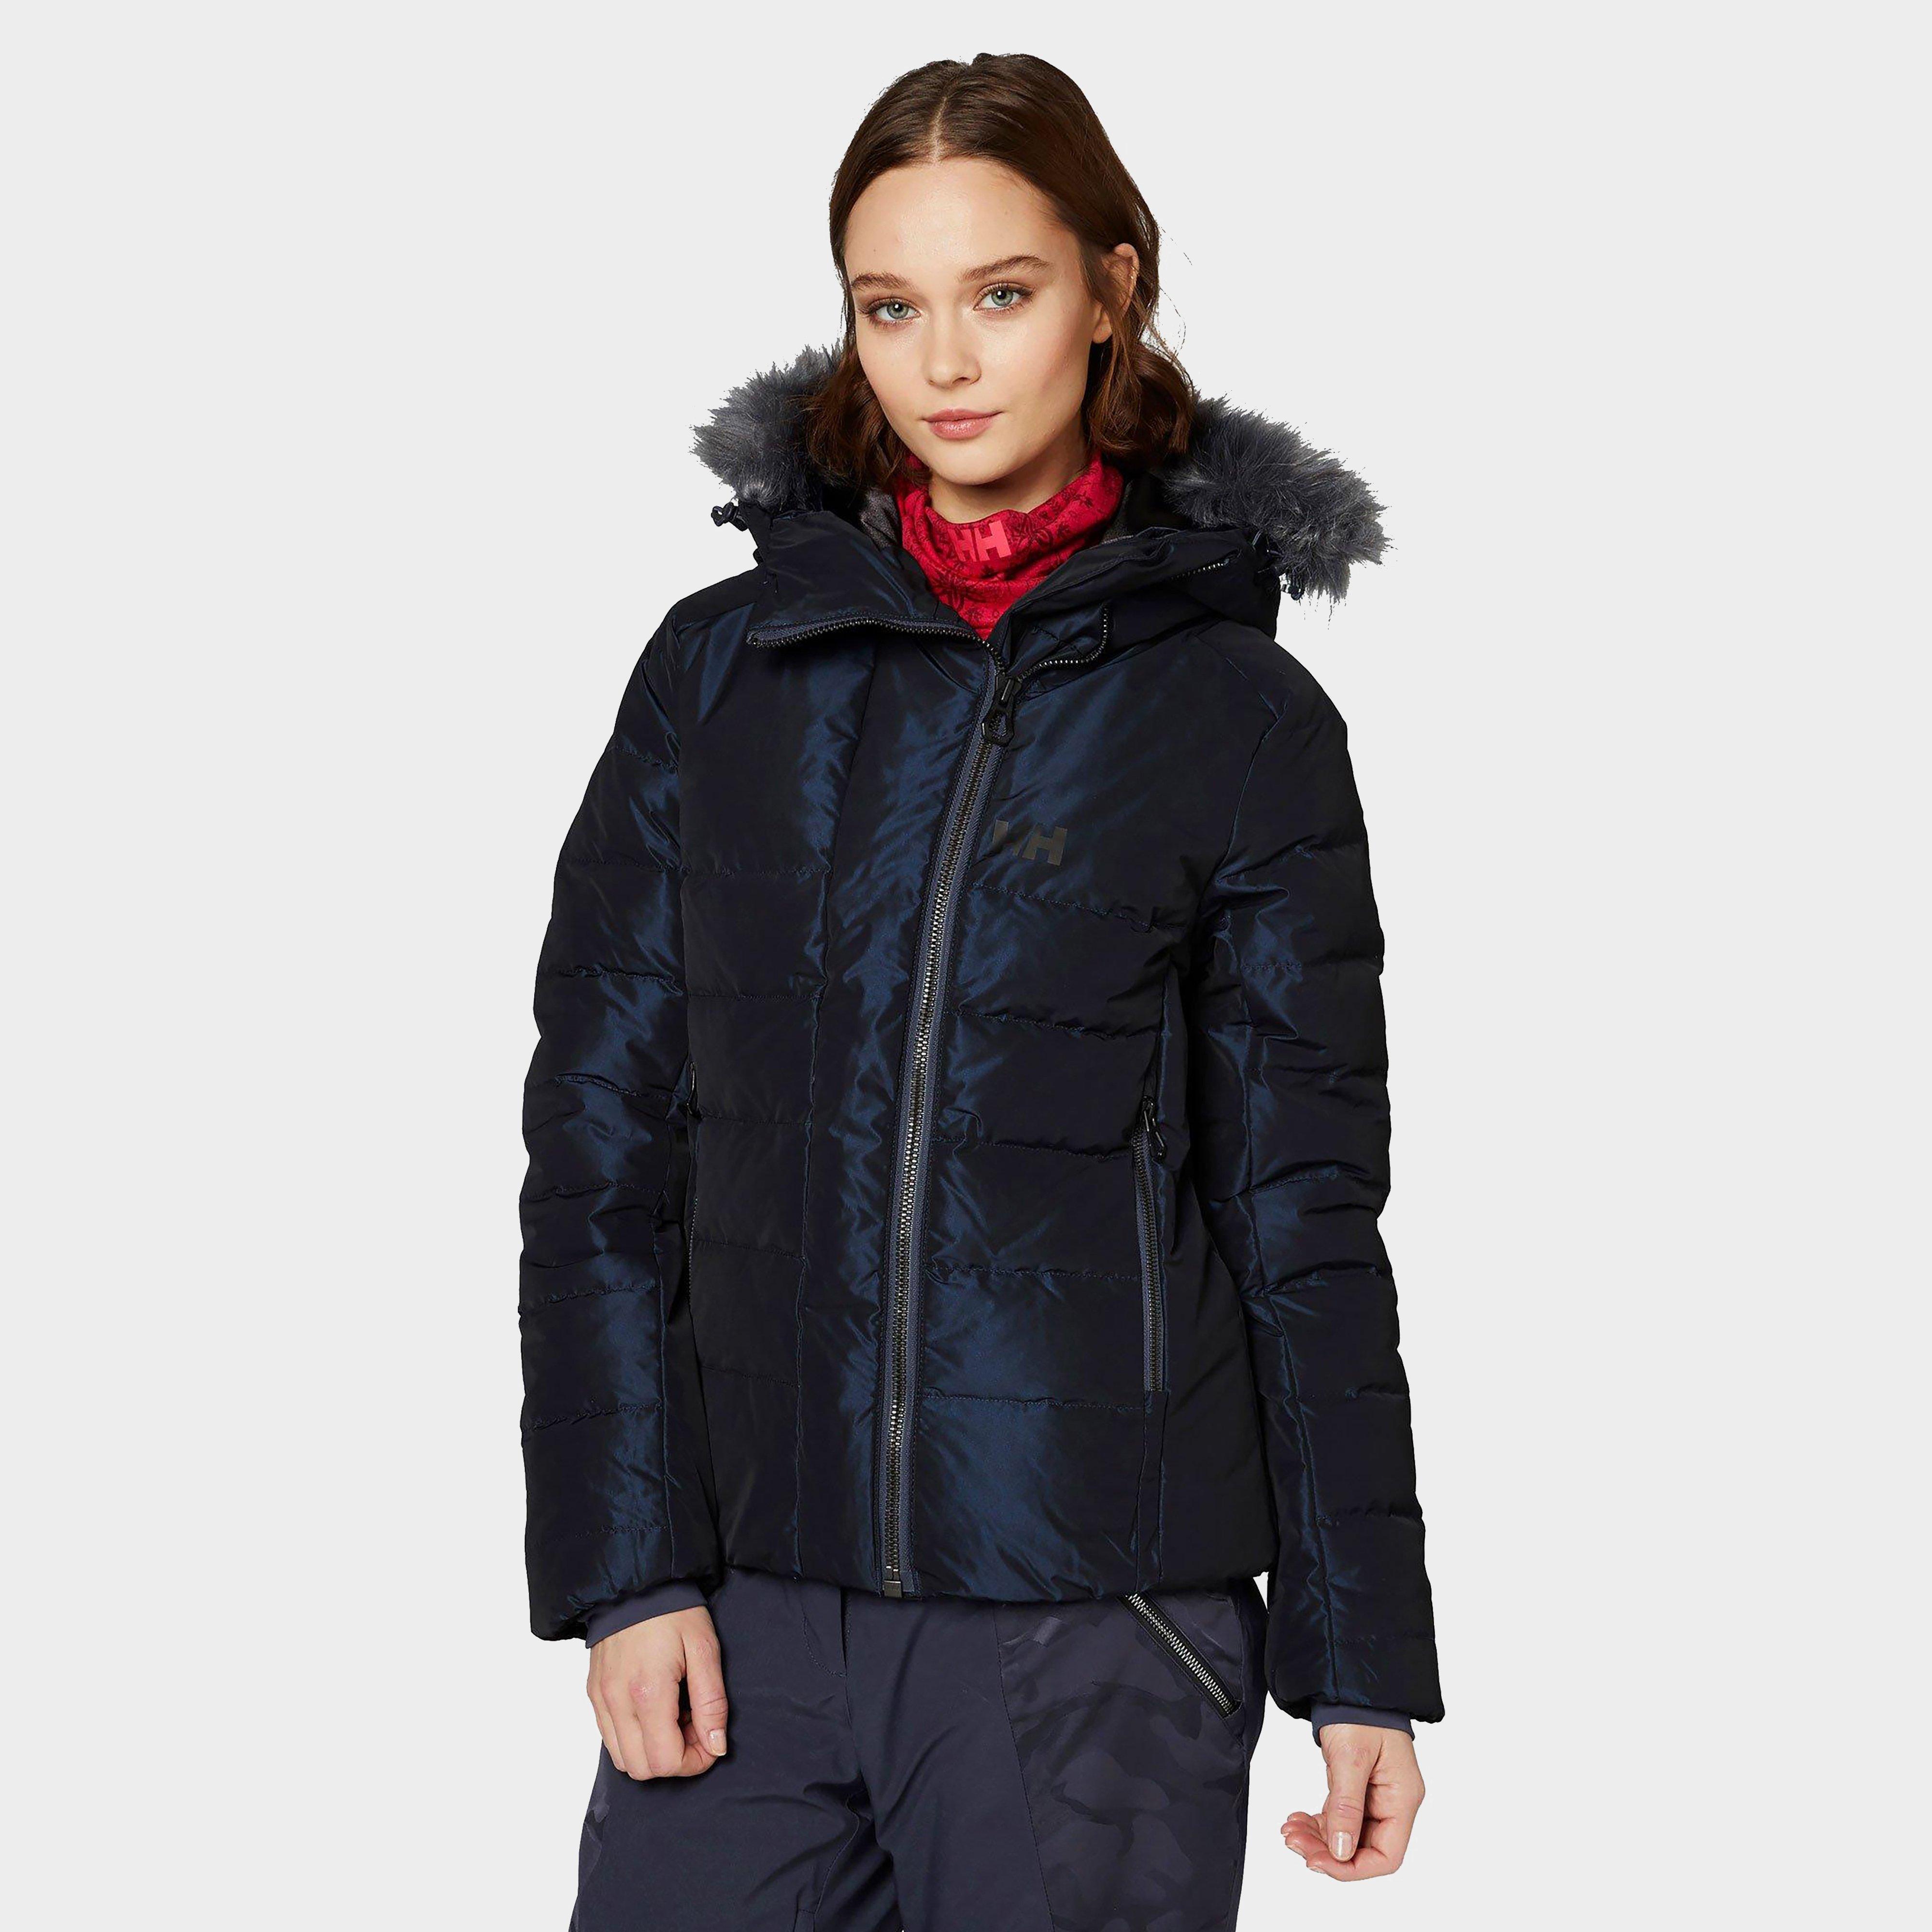 Helly Hansen Women's Primerose Ski Jacket